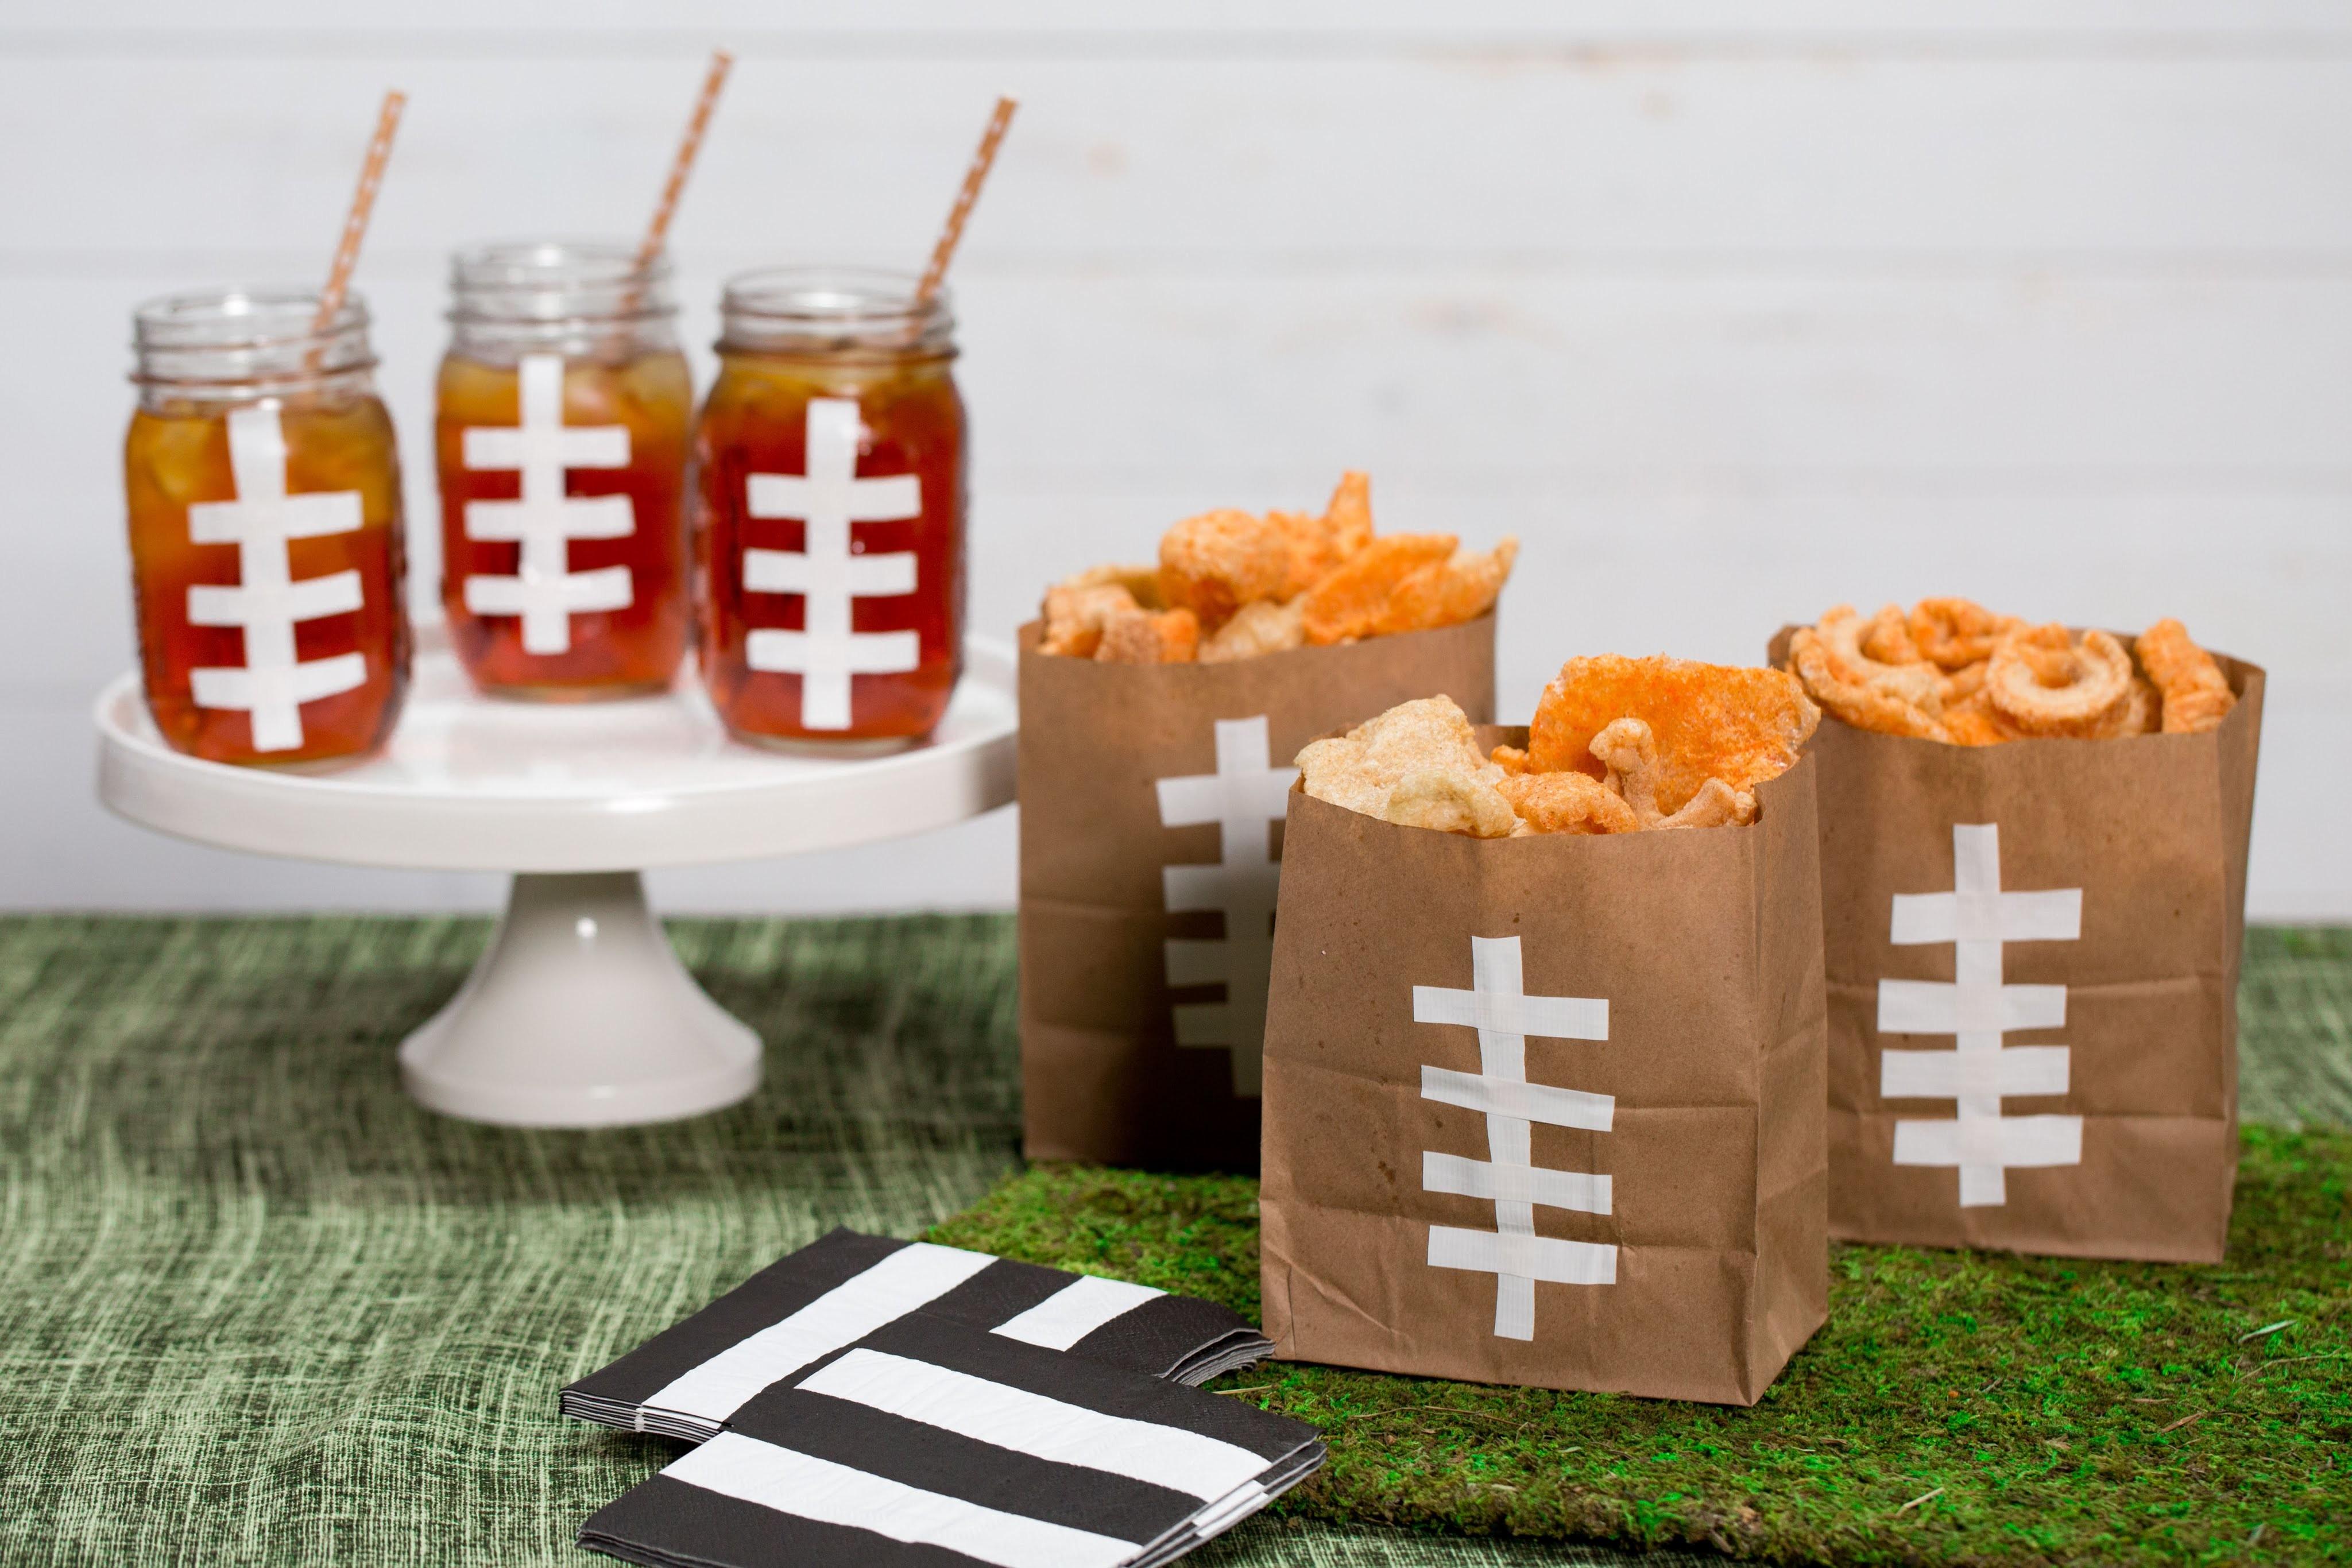 How To Make Cool Festive Football Bags and Mason Jars   Southern Living